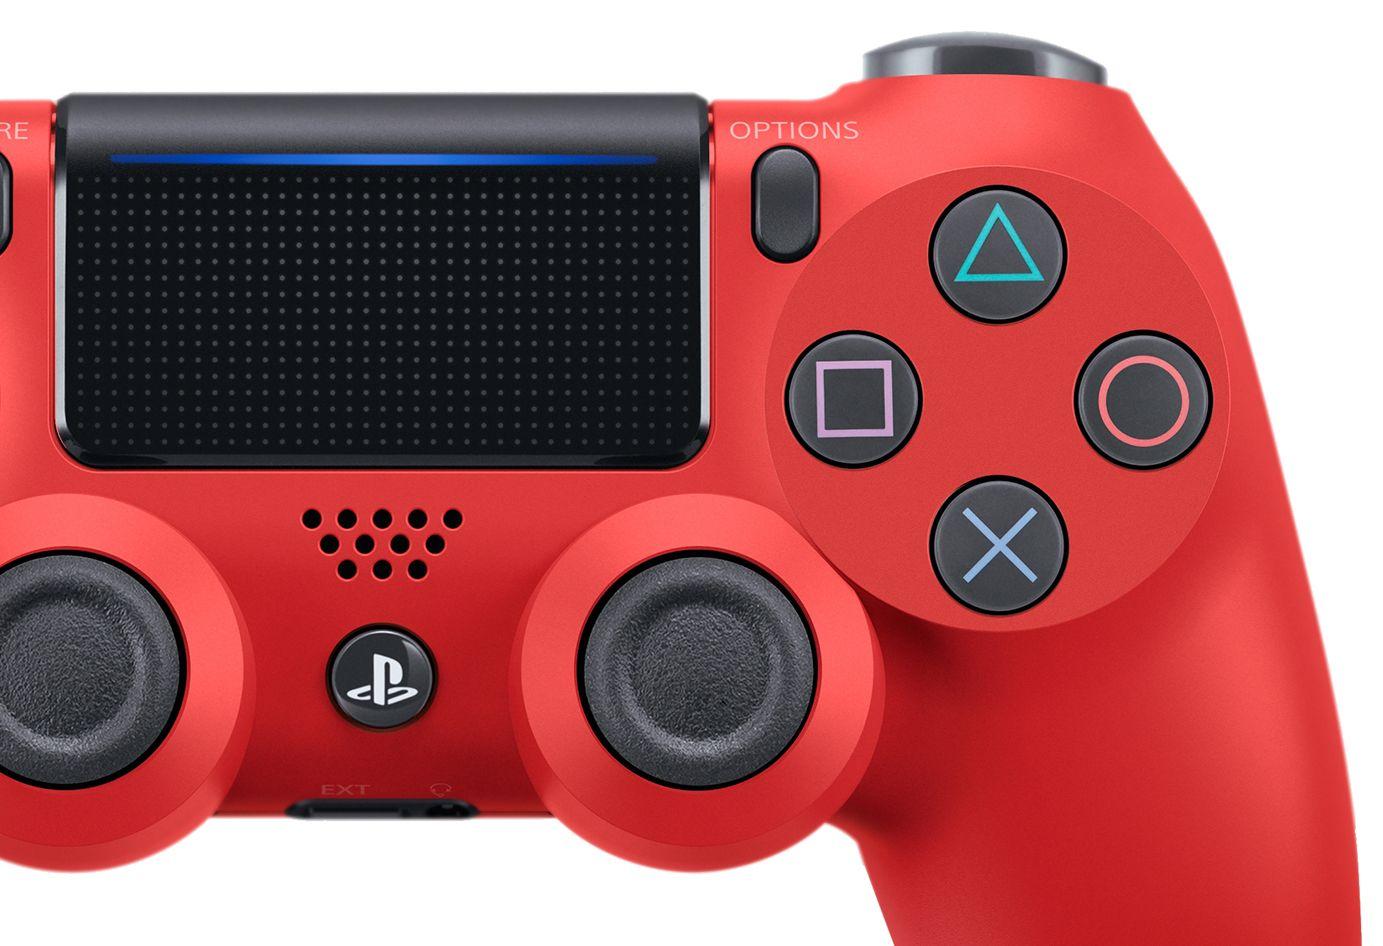 Controller SONY Dualshock 4 V2 pentru PlayStation 4, Magma Red